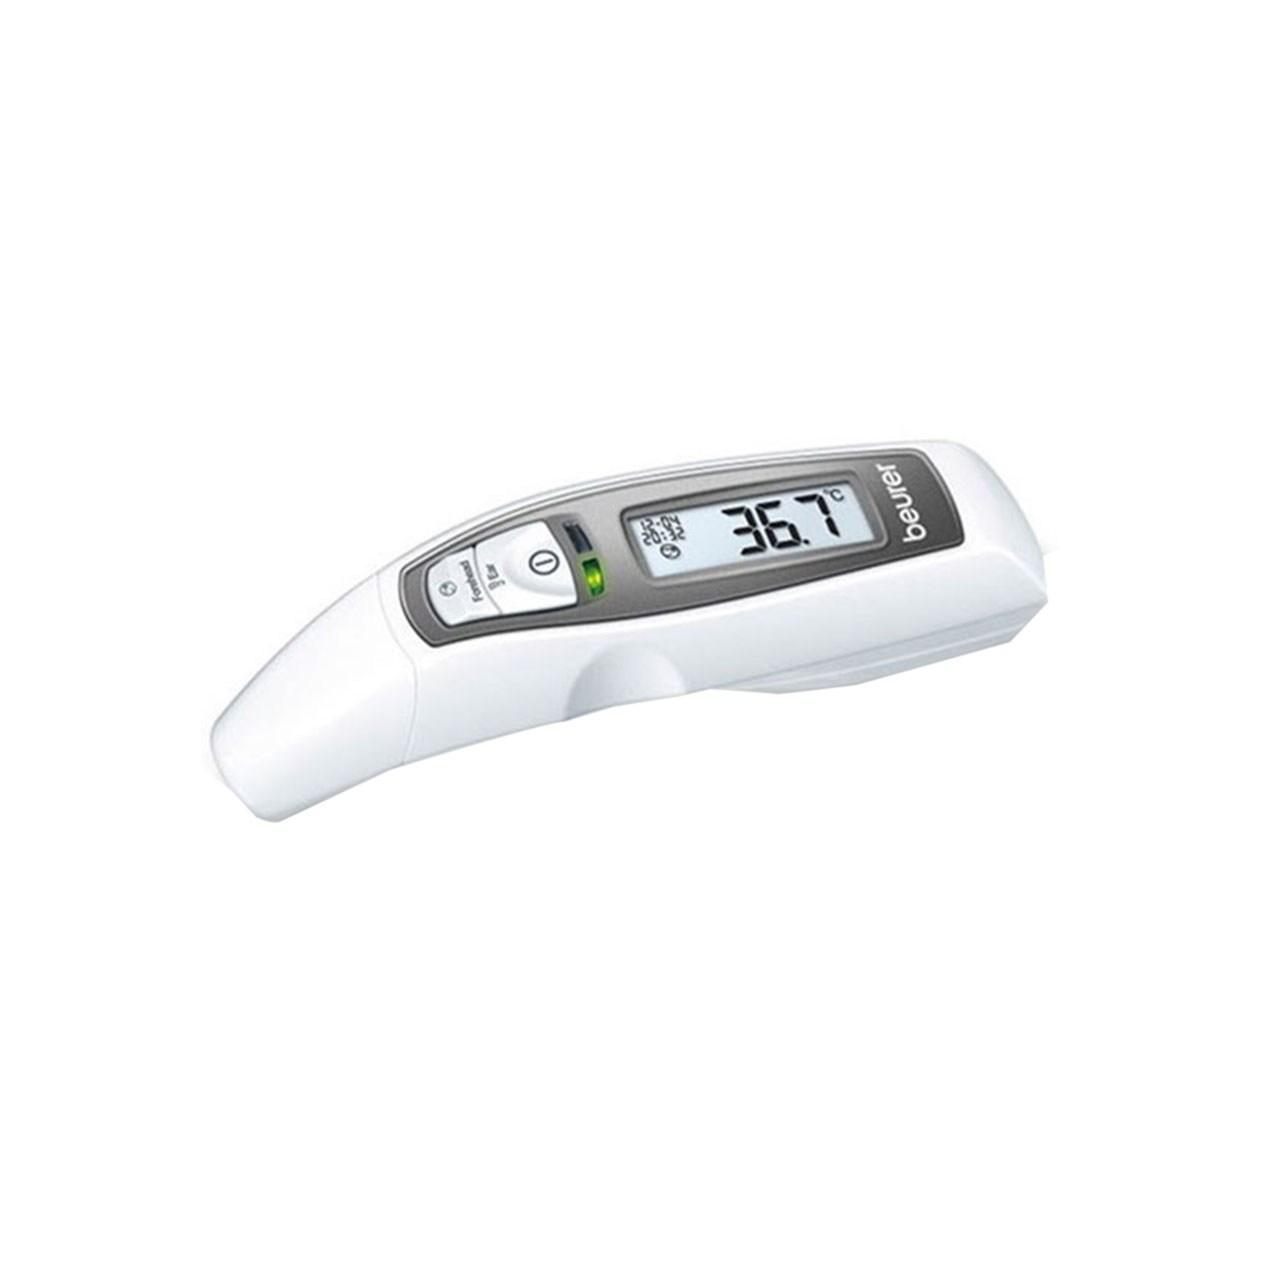 فروش اقساطی دماسنج دیجیتال بیورر FT65